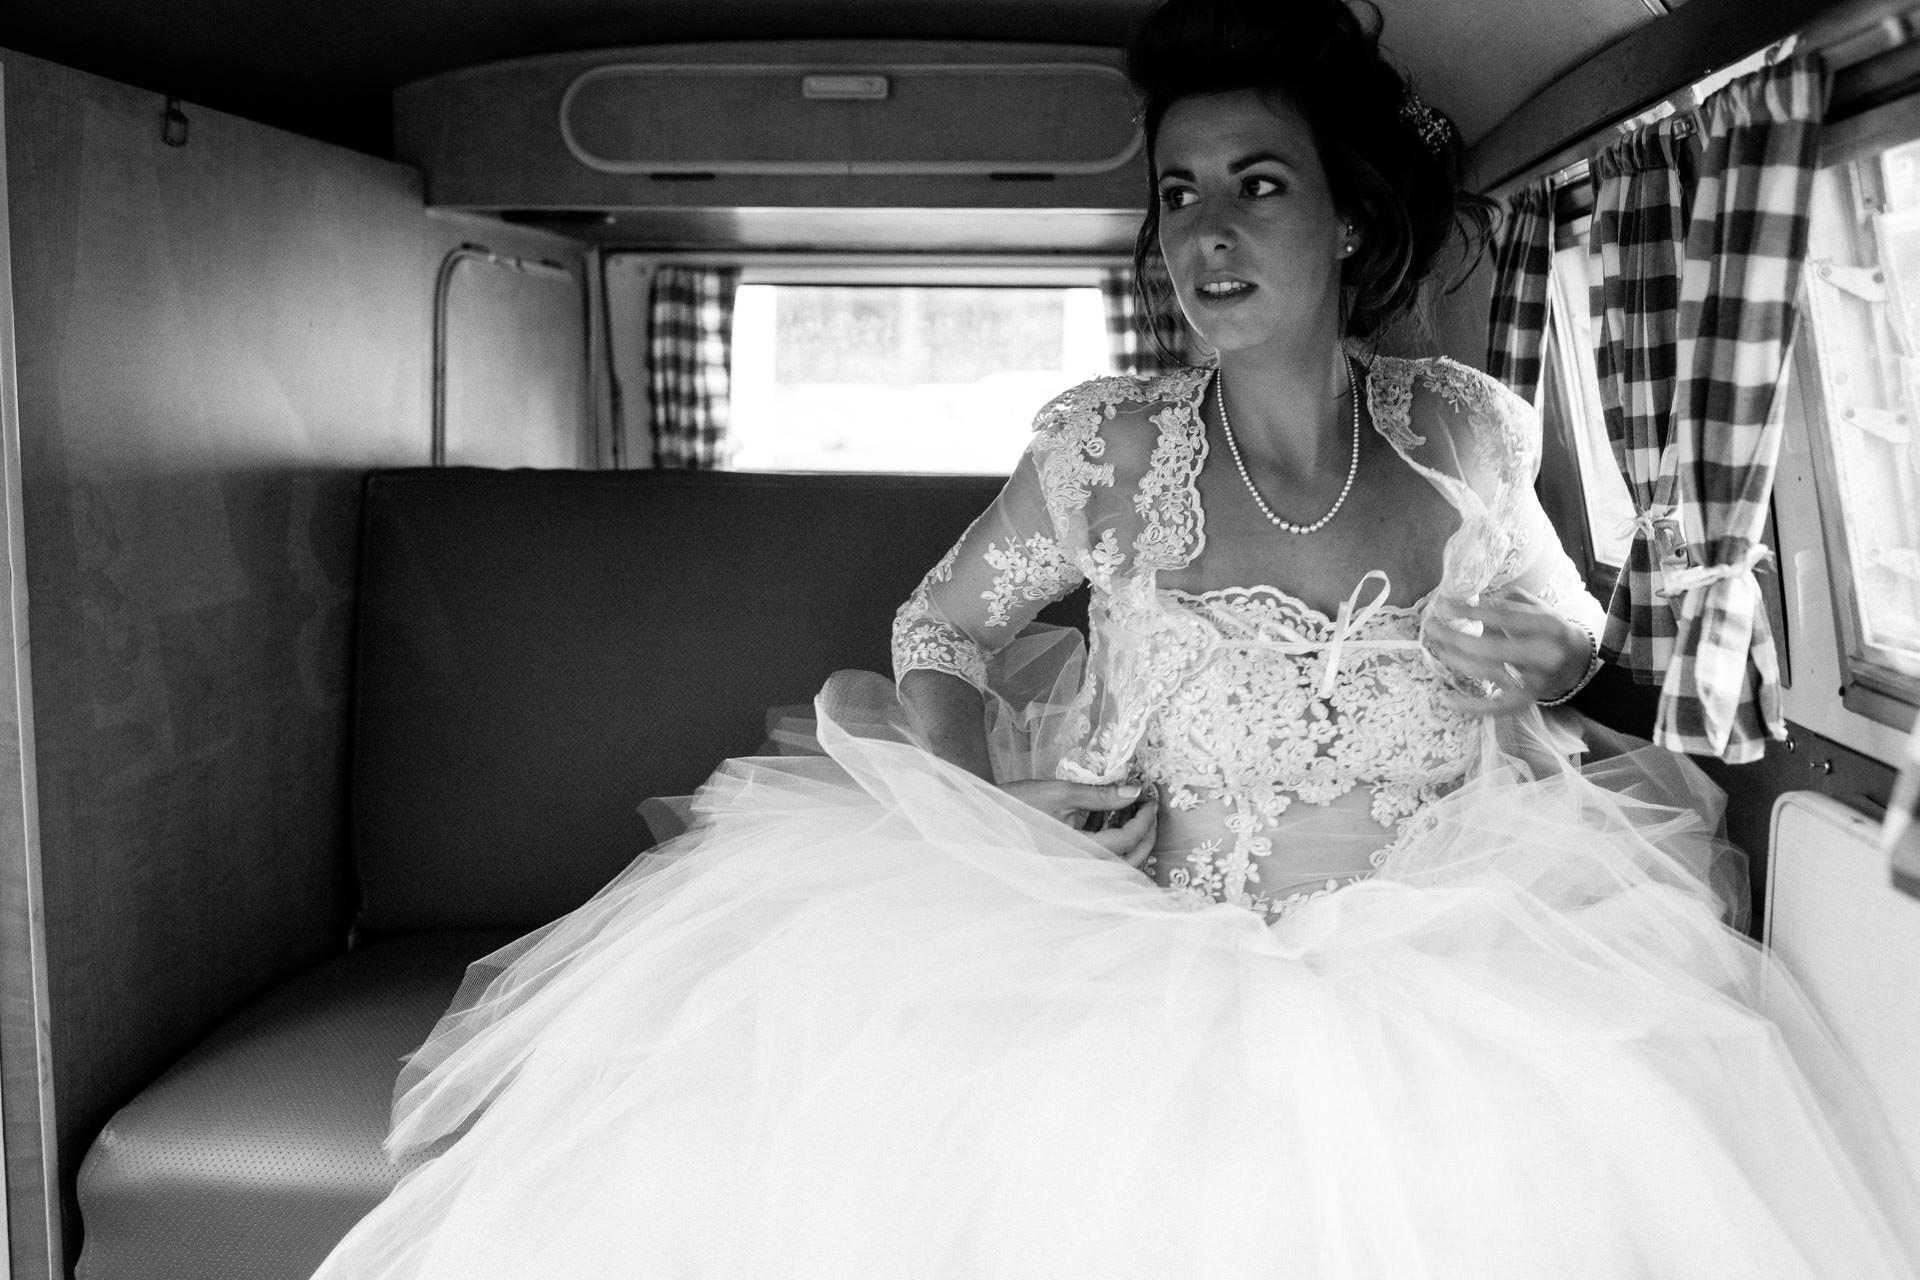 Photographe de Mariage Rock combi Vw glamrock